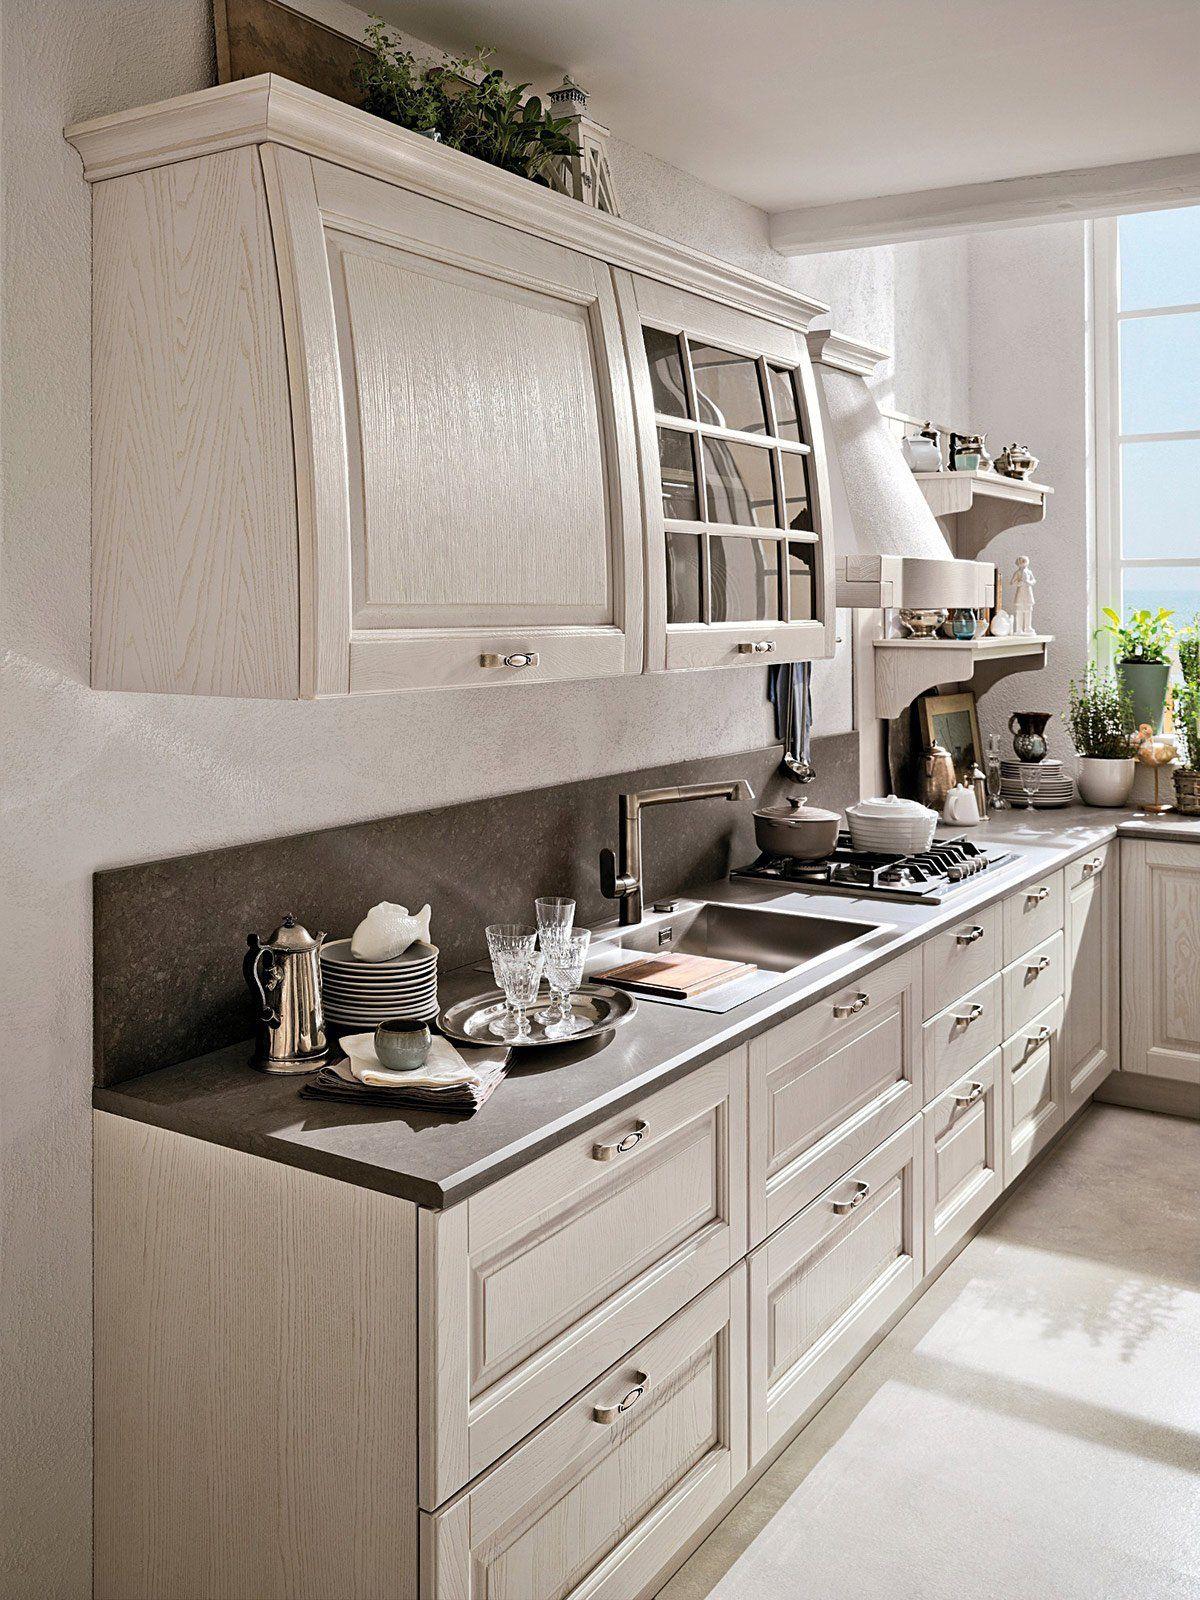 Cucine country stile tradizionale o new classic cucine for Stosa cucine verona